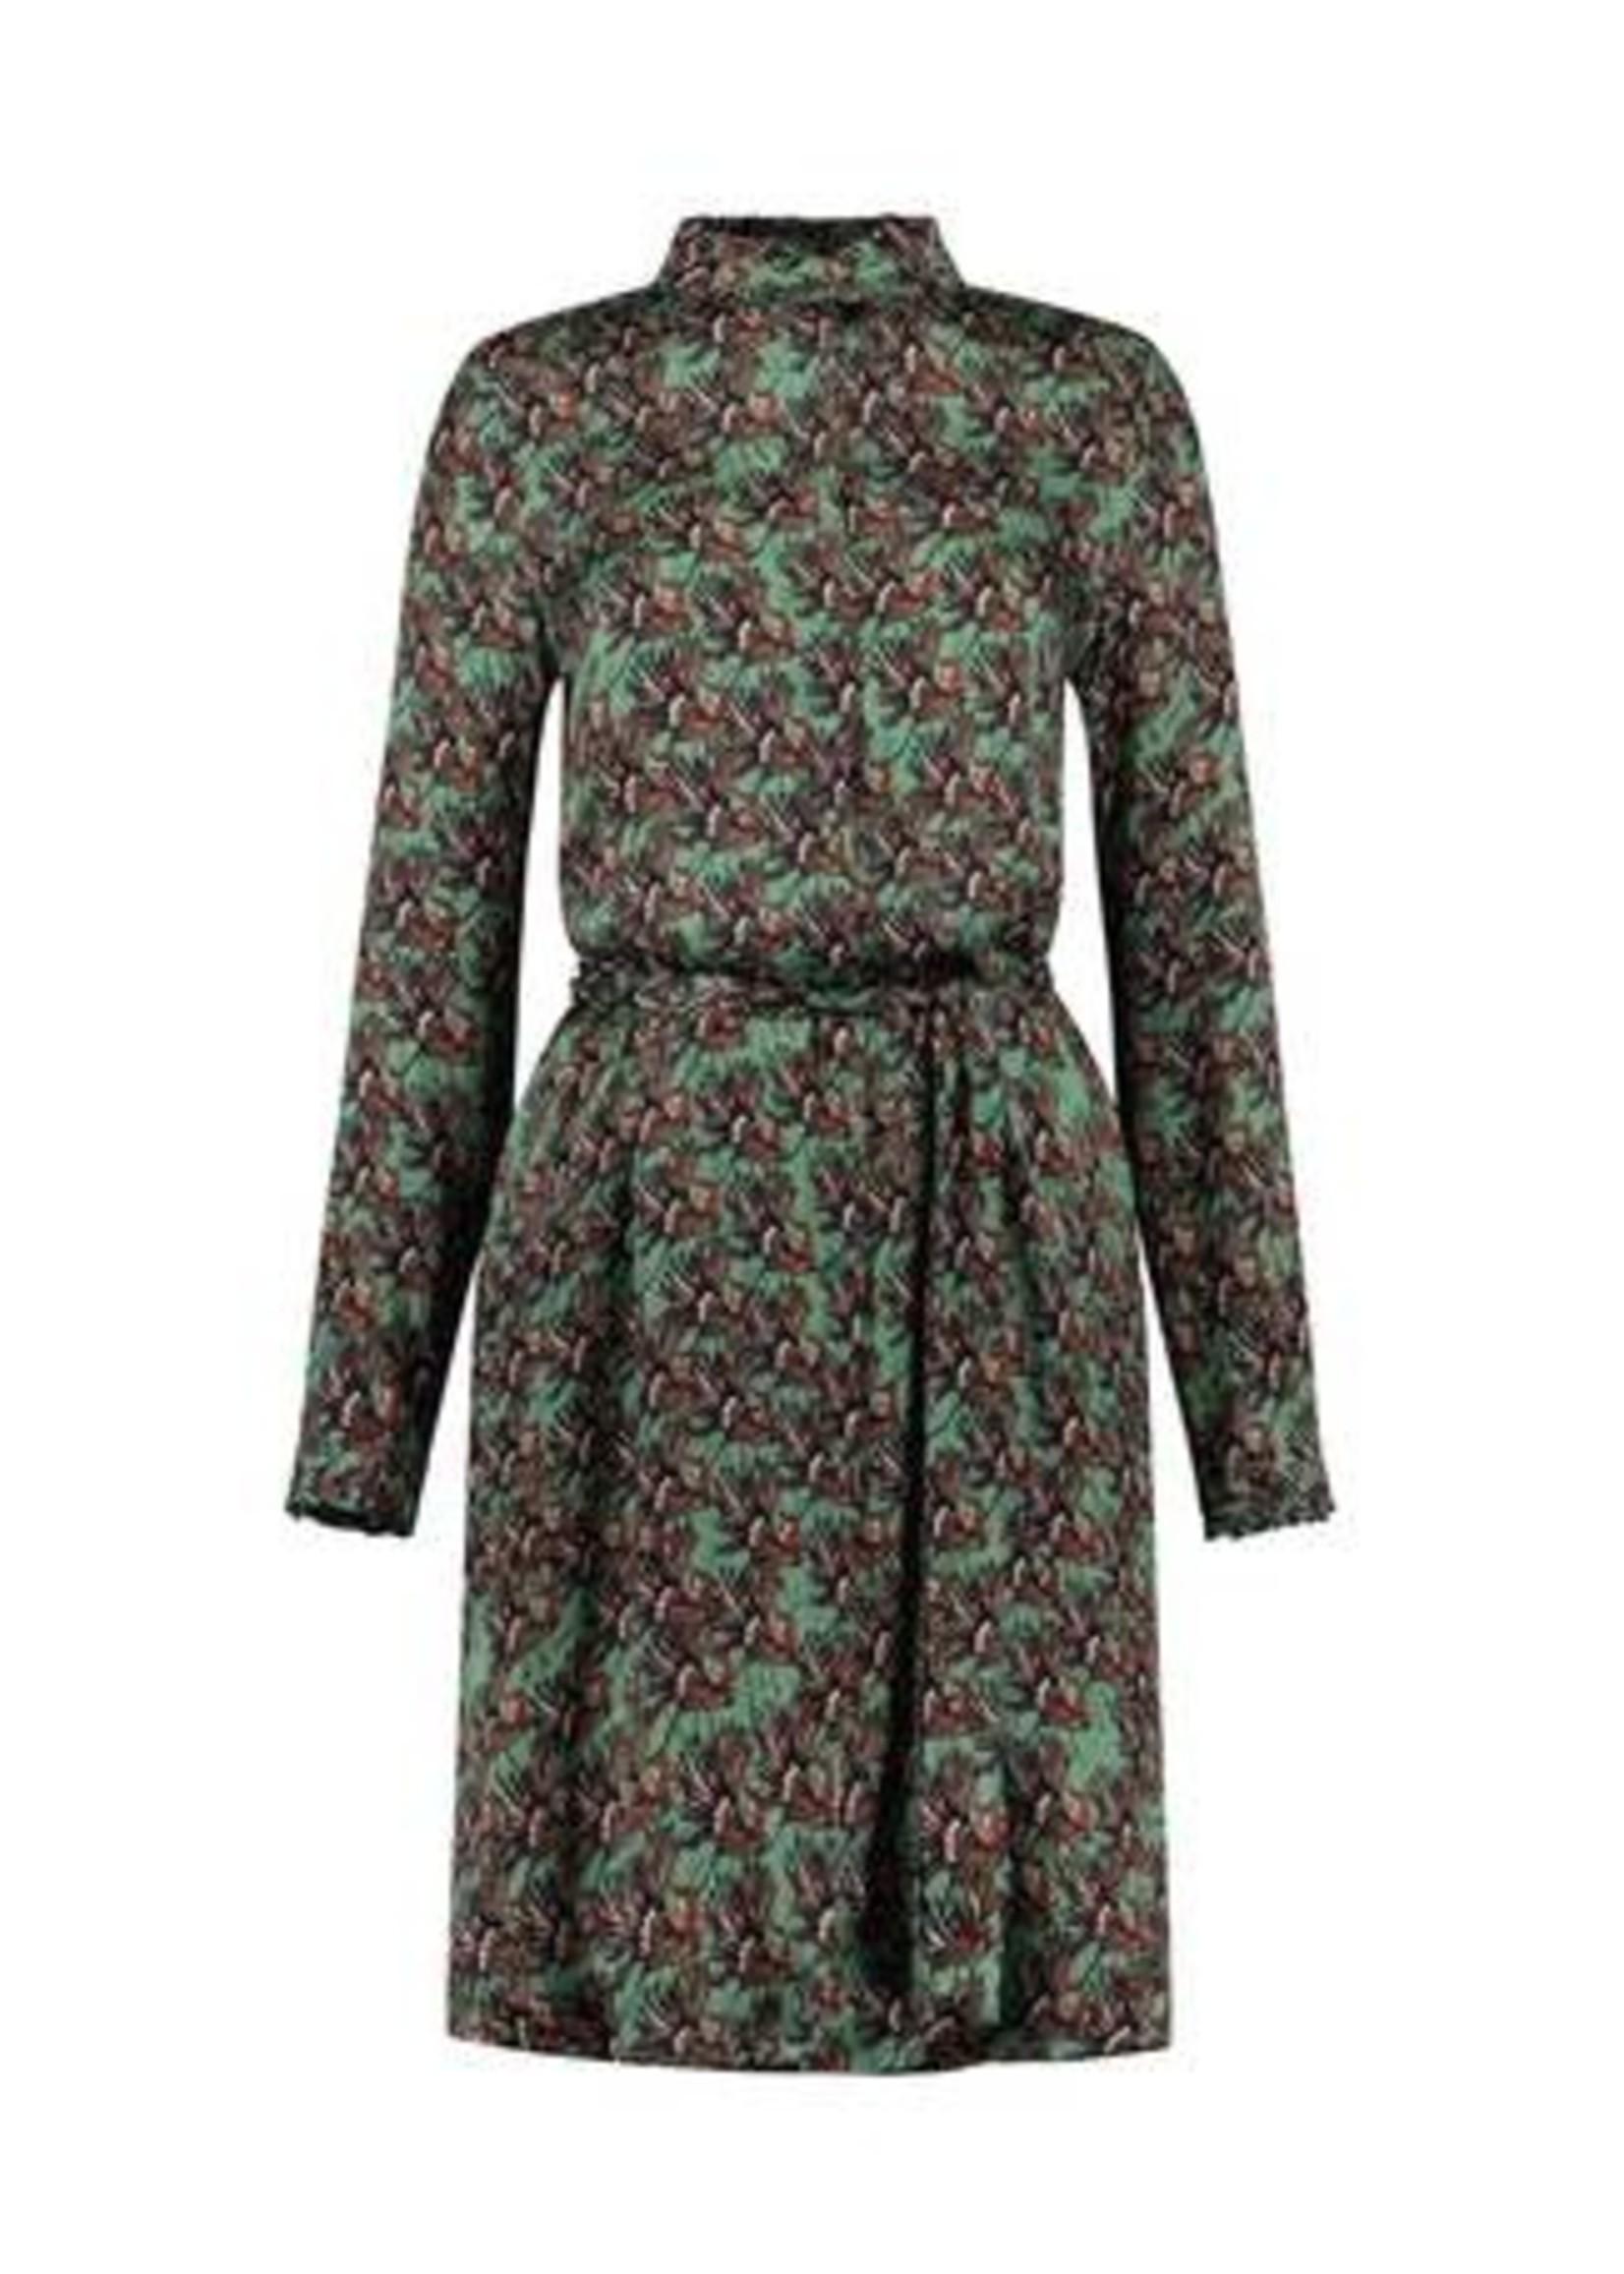 Pom Amsterdam Dress - Paradise Birds Green